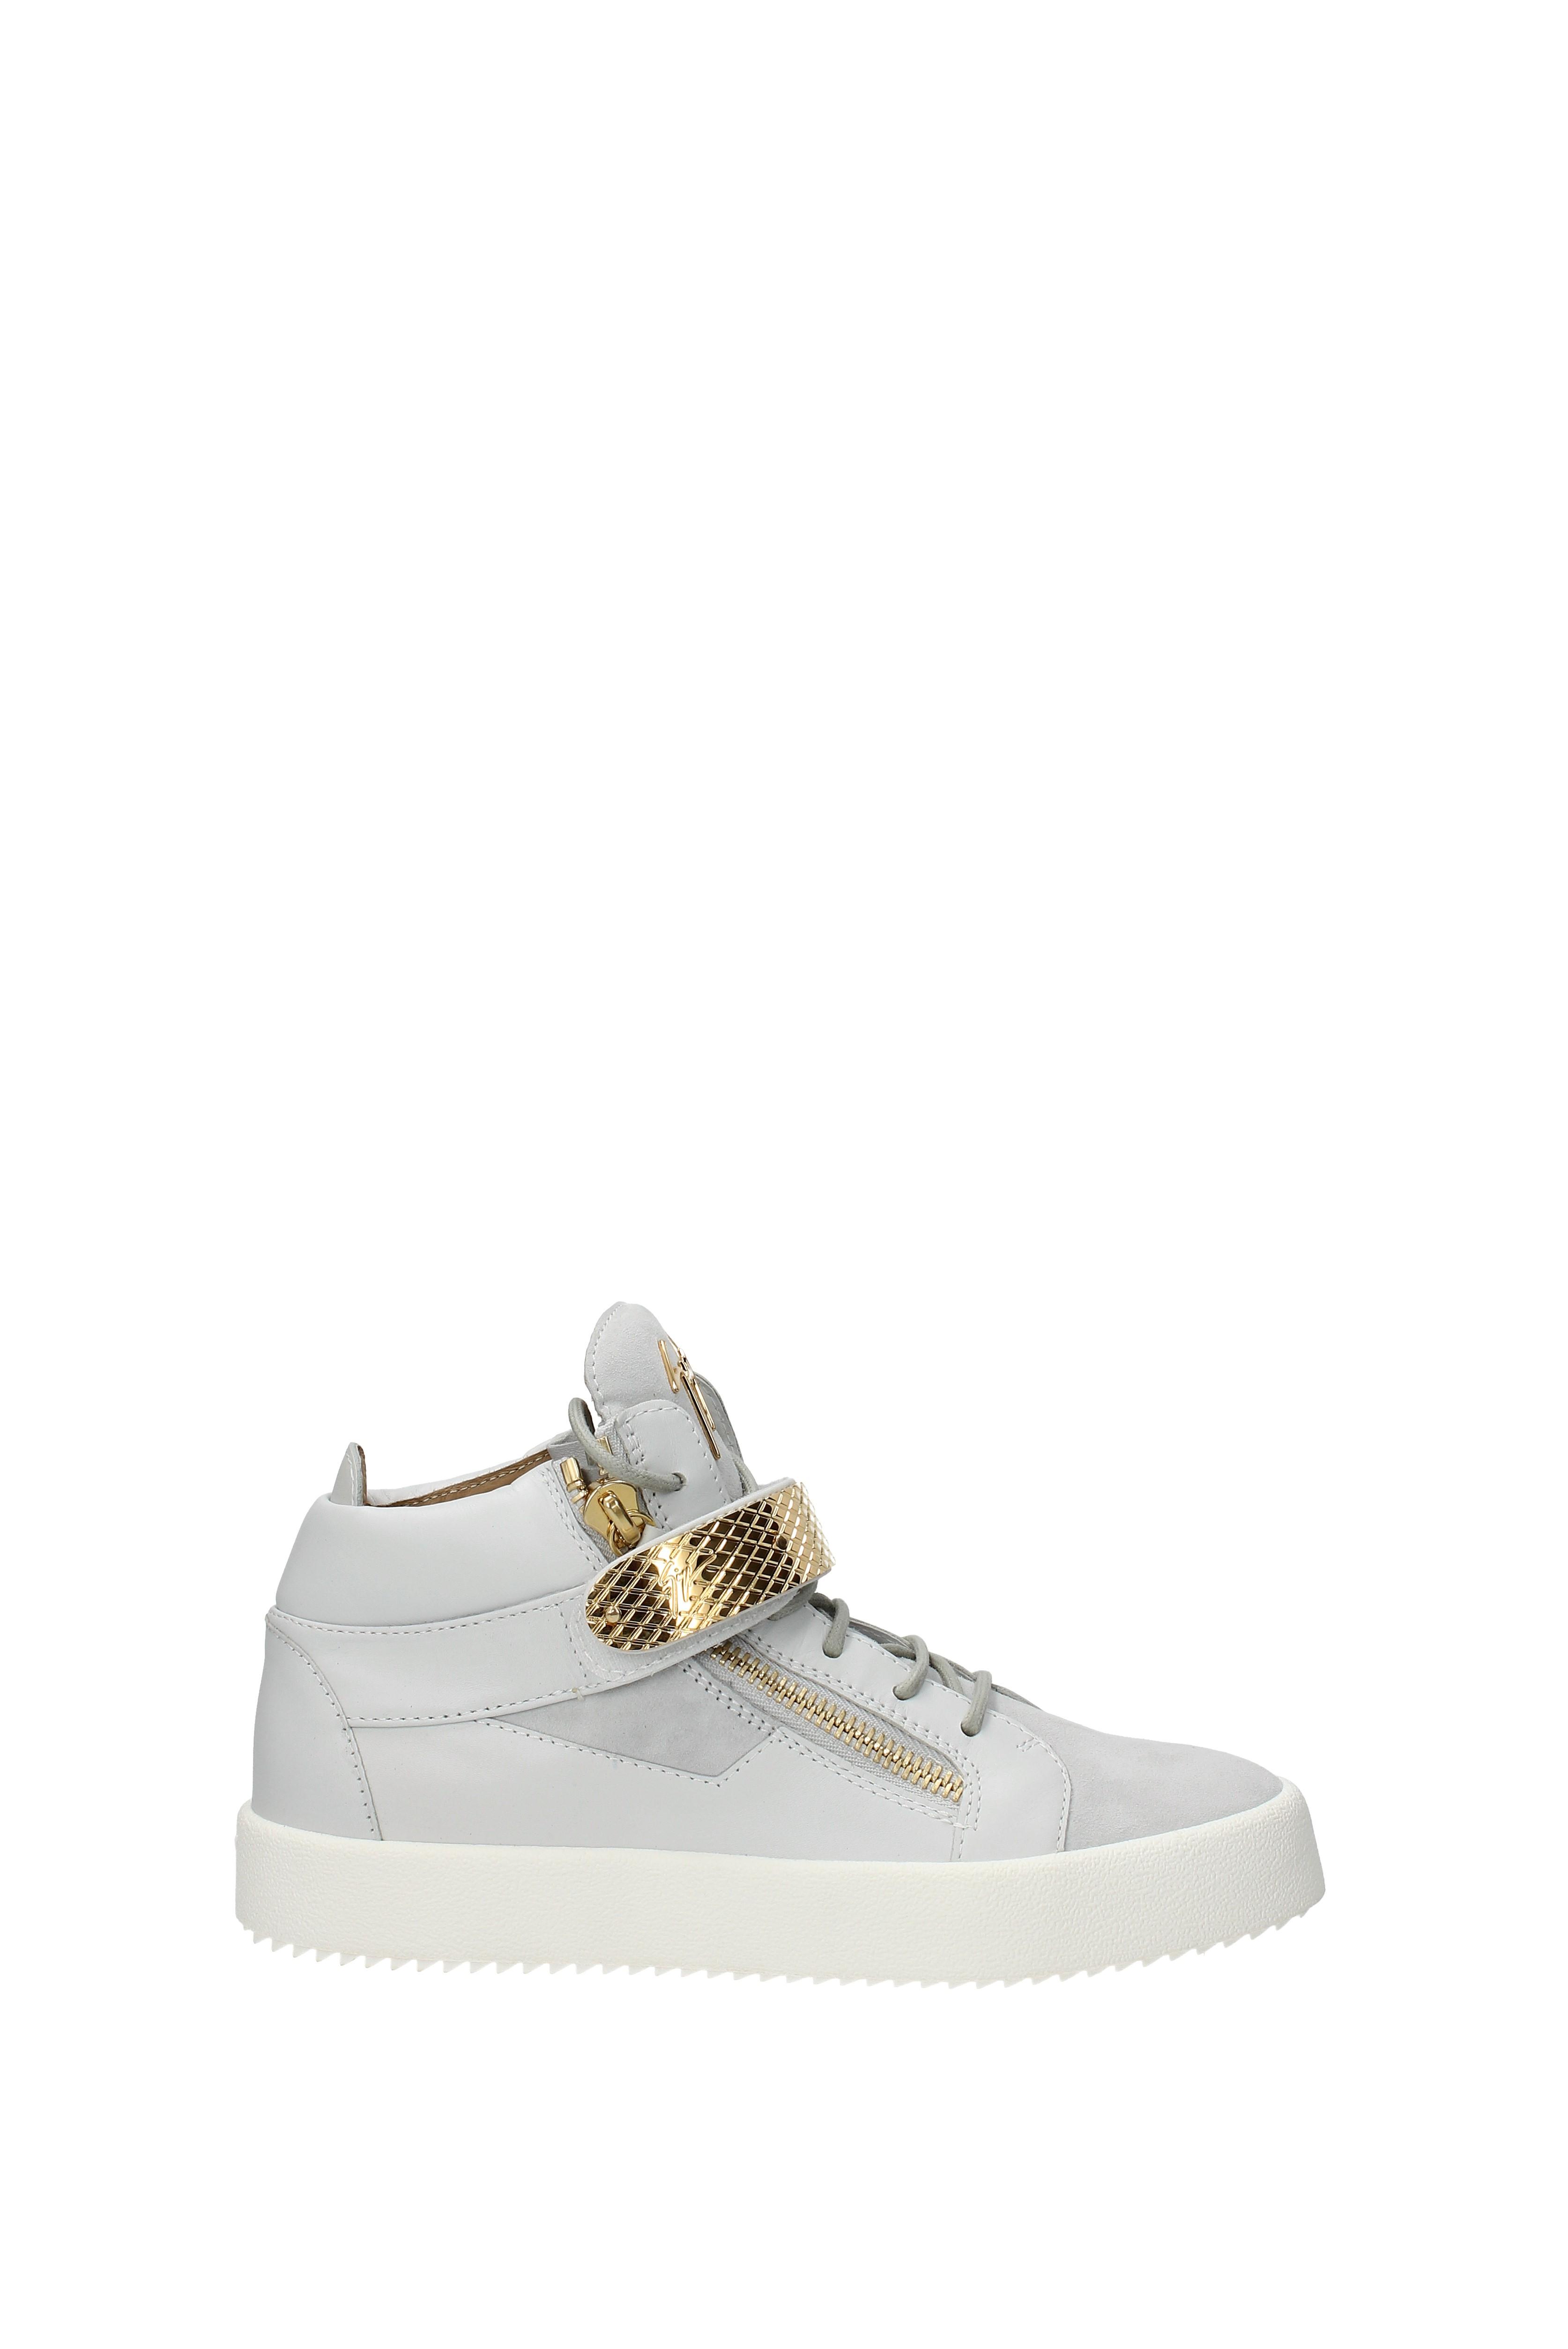 Sneakers Giuseppe Zanotti london may london Zanotti Uomo - Camoscio (RM800025MAYLONDON) e7968a